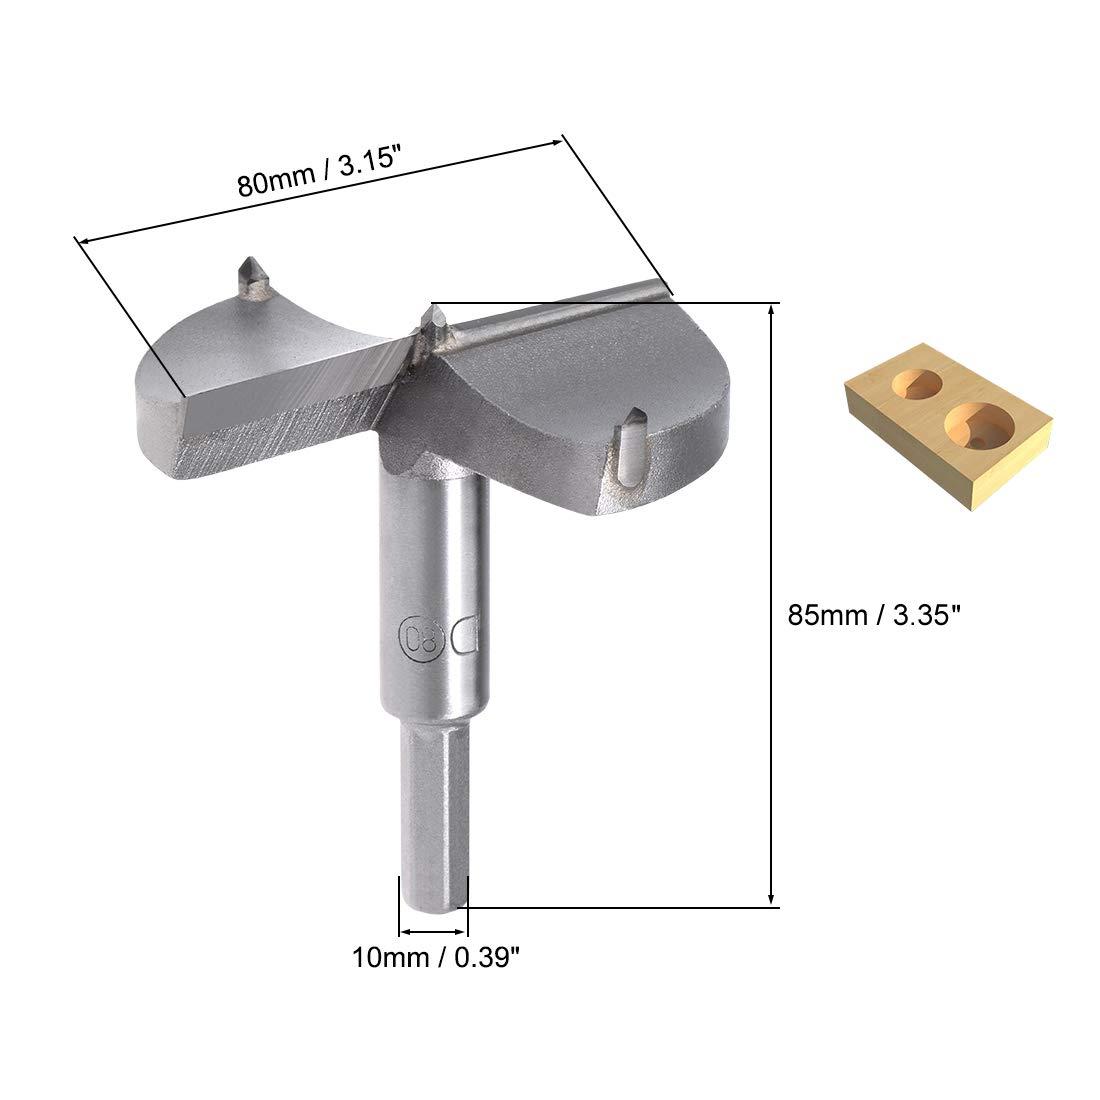 Forstner Brocas Maso cortador de perforaci/ón de perforaci/ón de perforaci/ón para madera de pl/ástico de 15 mm a 80 mm paquete de 1